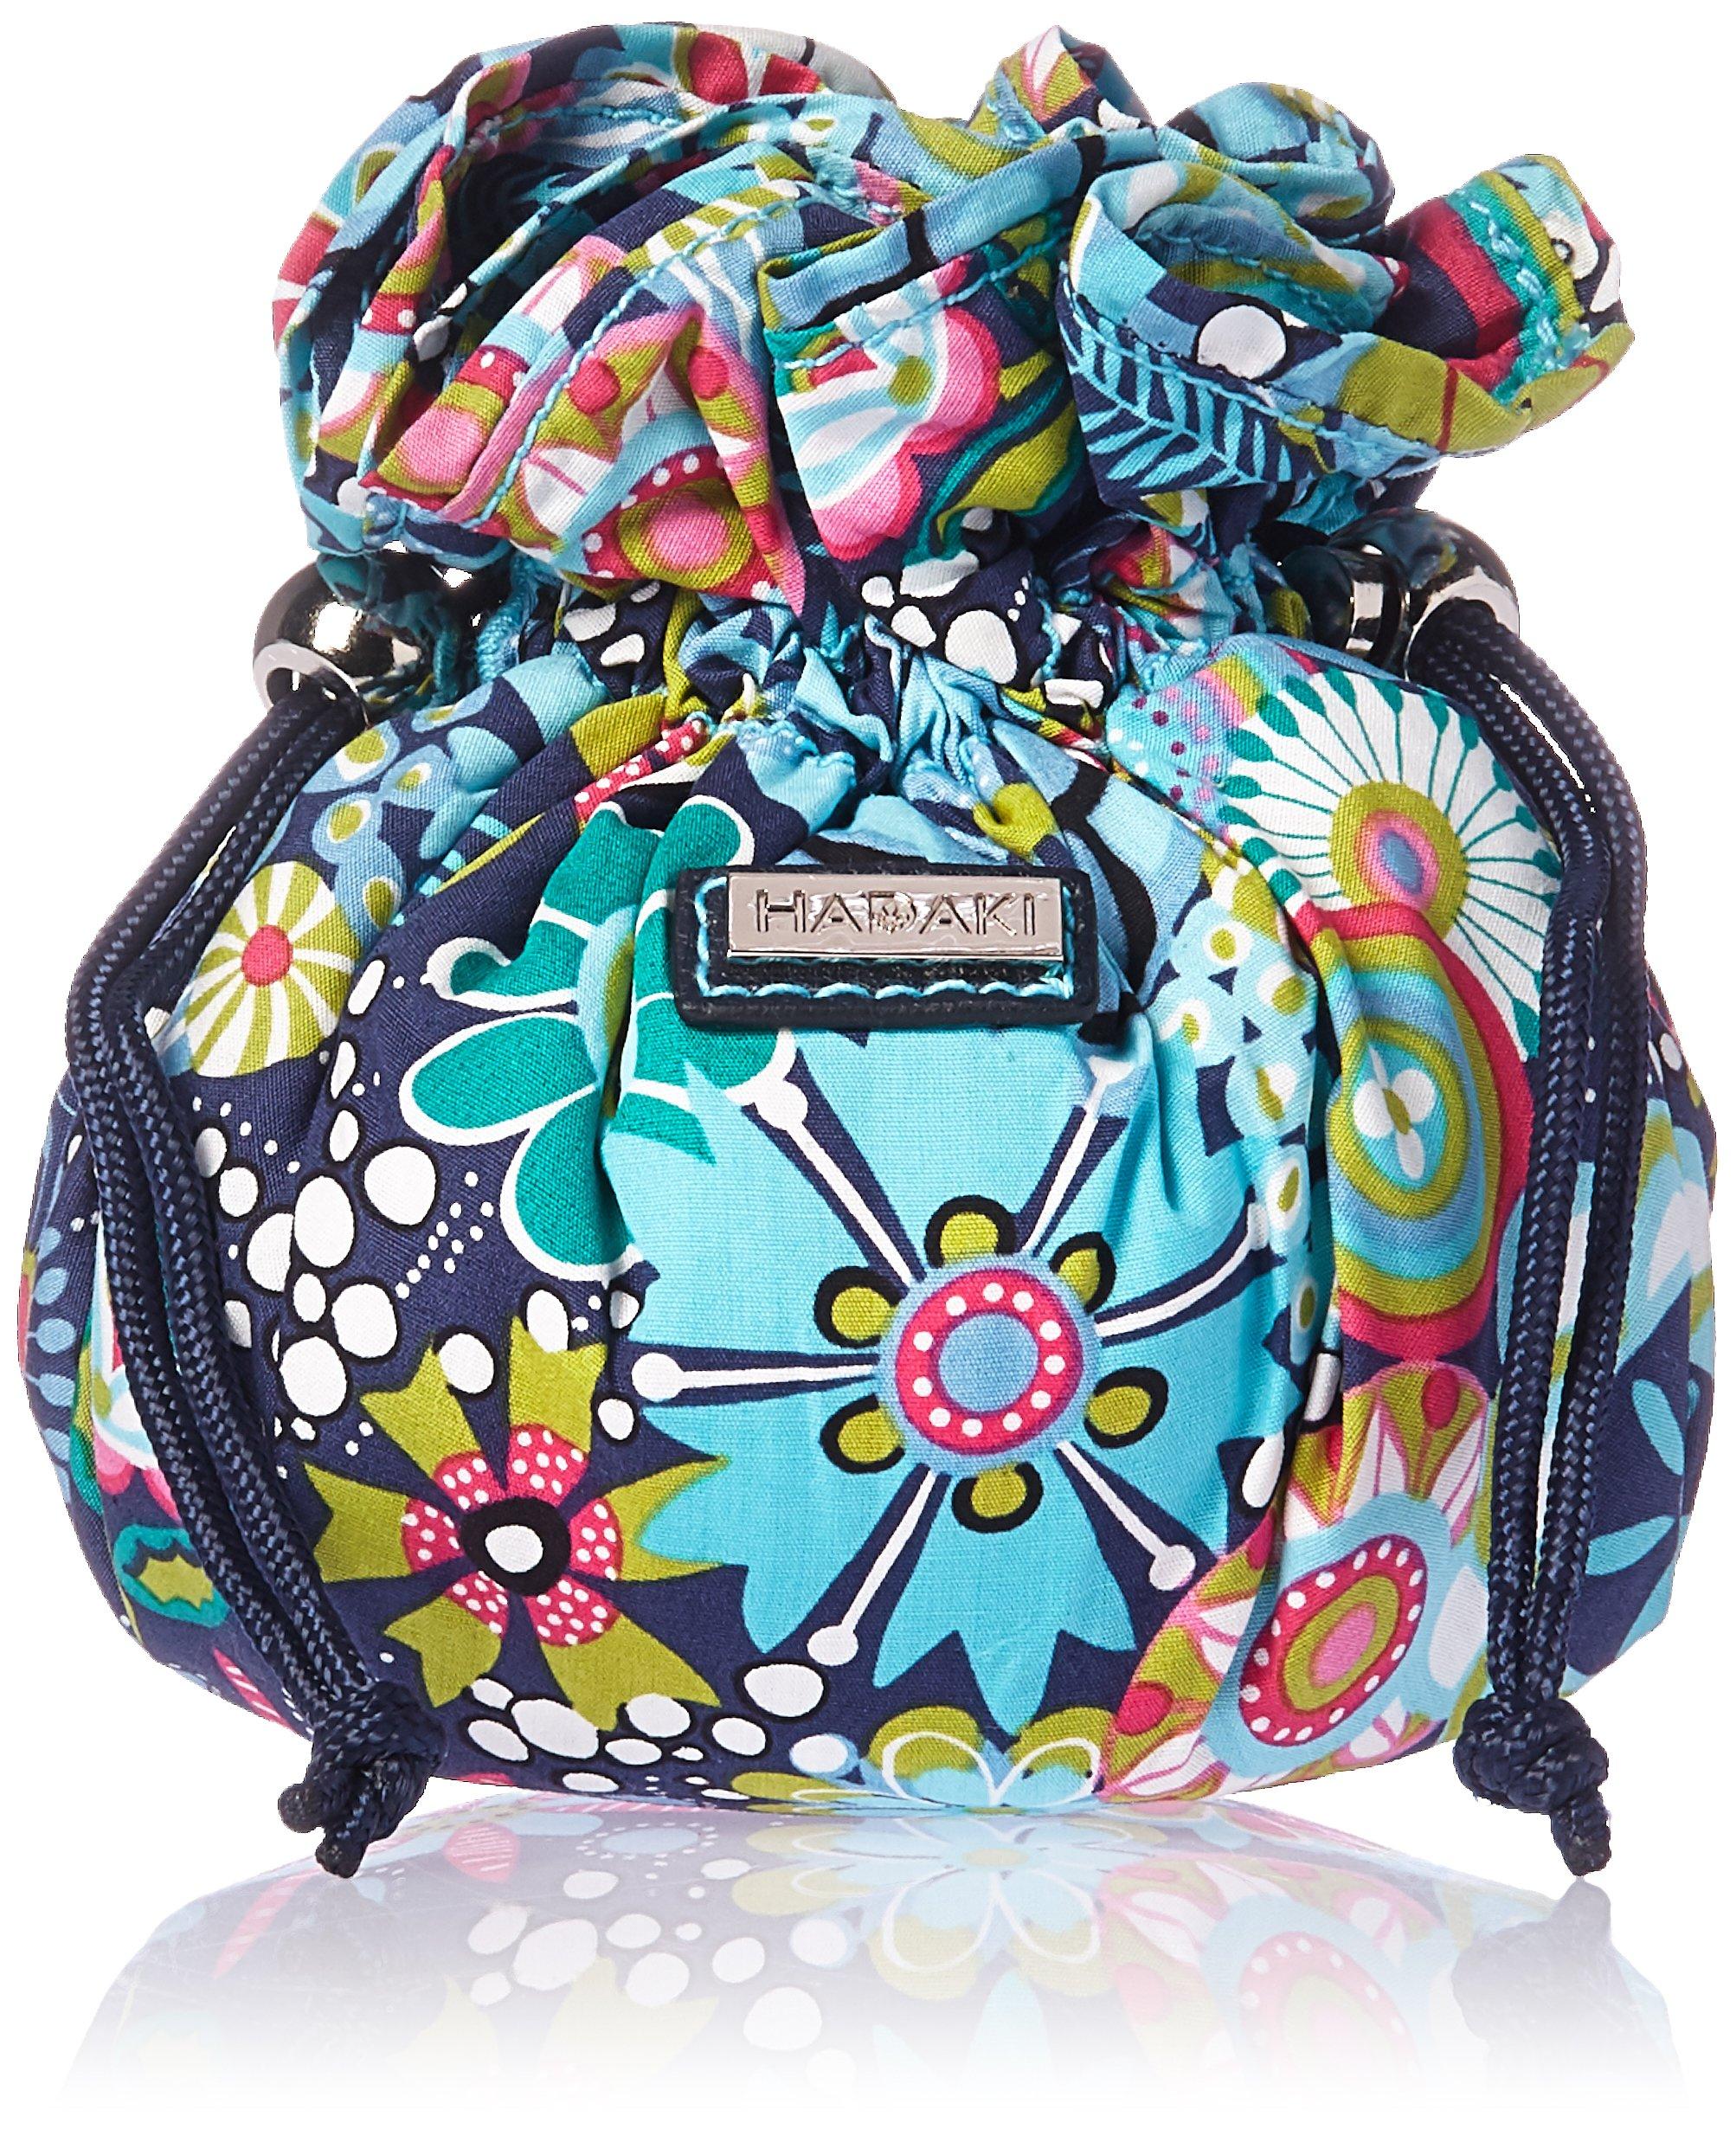 Hadaki Cotton Jewelry Sack Backpack,Dixie Daisies,One Size